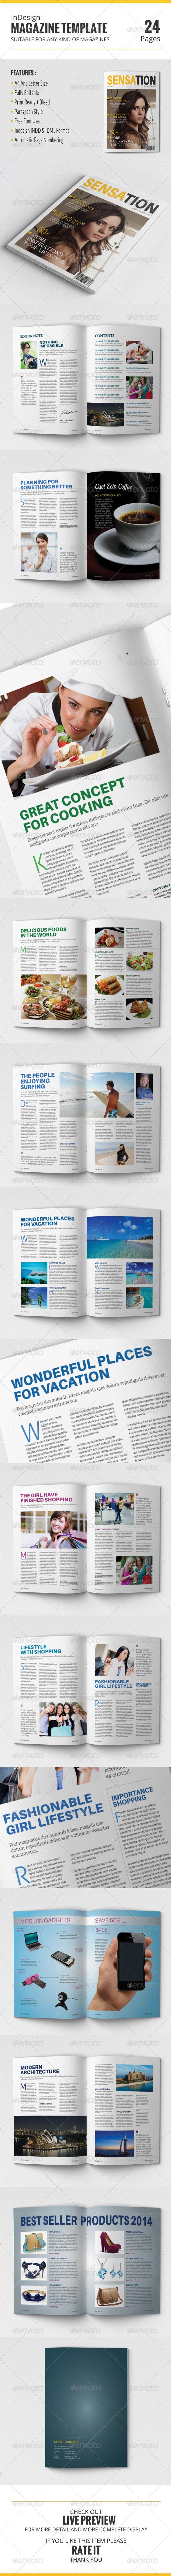 GraphicRiver InDesign Magazine Template 8008575